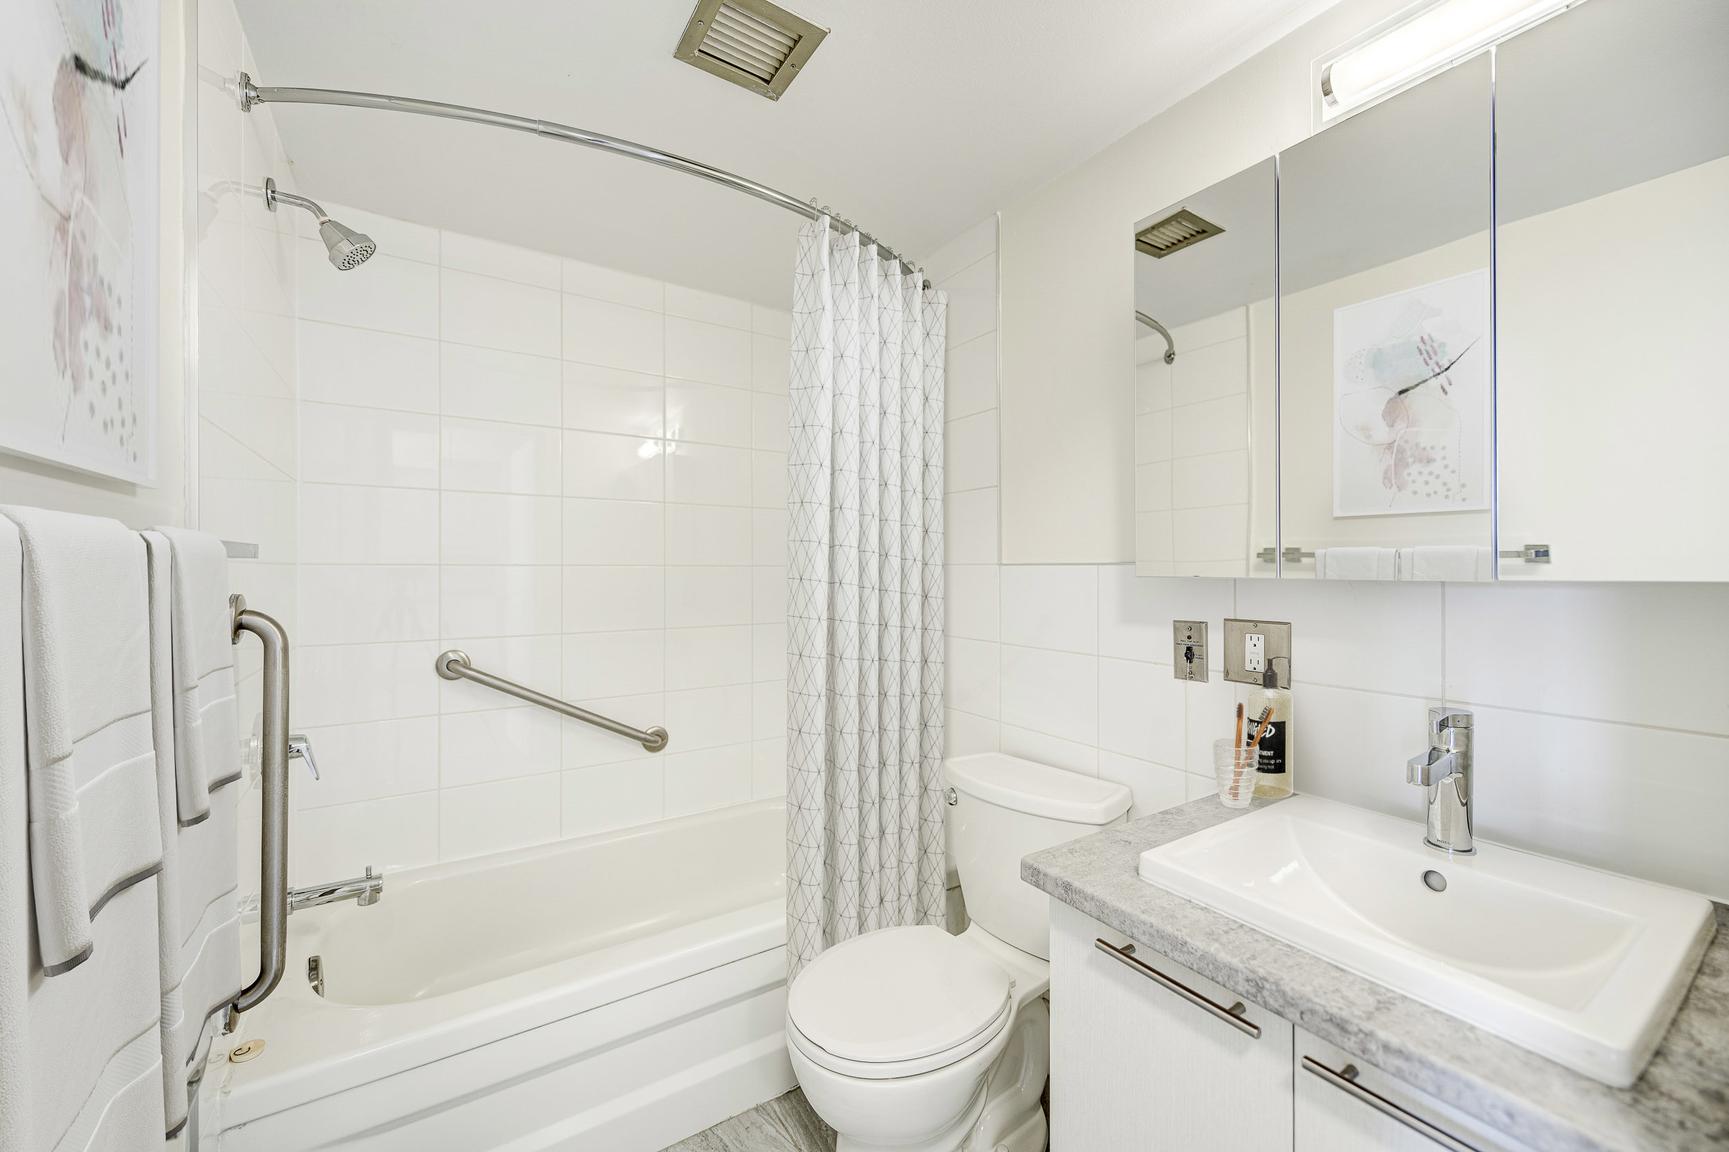 2 bedroom Apartments for rent in Laval at Le Quatre Cent - Photo 05 - RentQuebecApartments – L407185